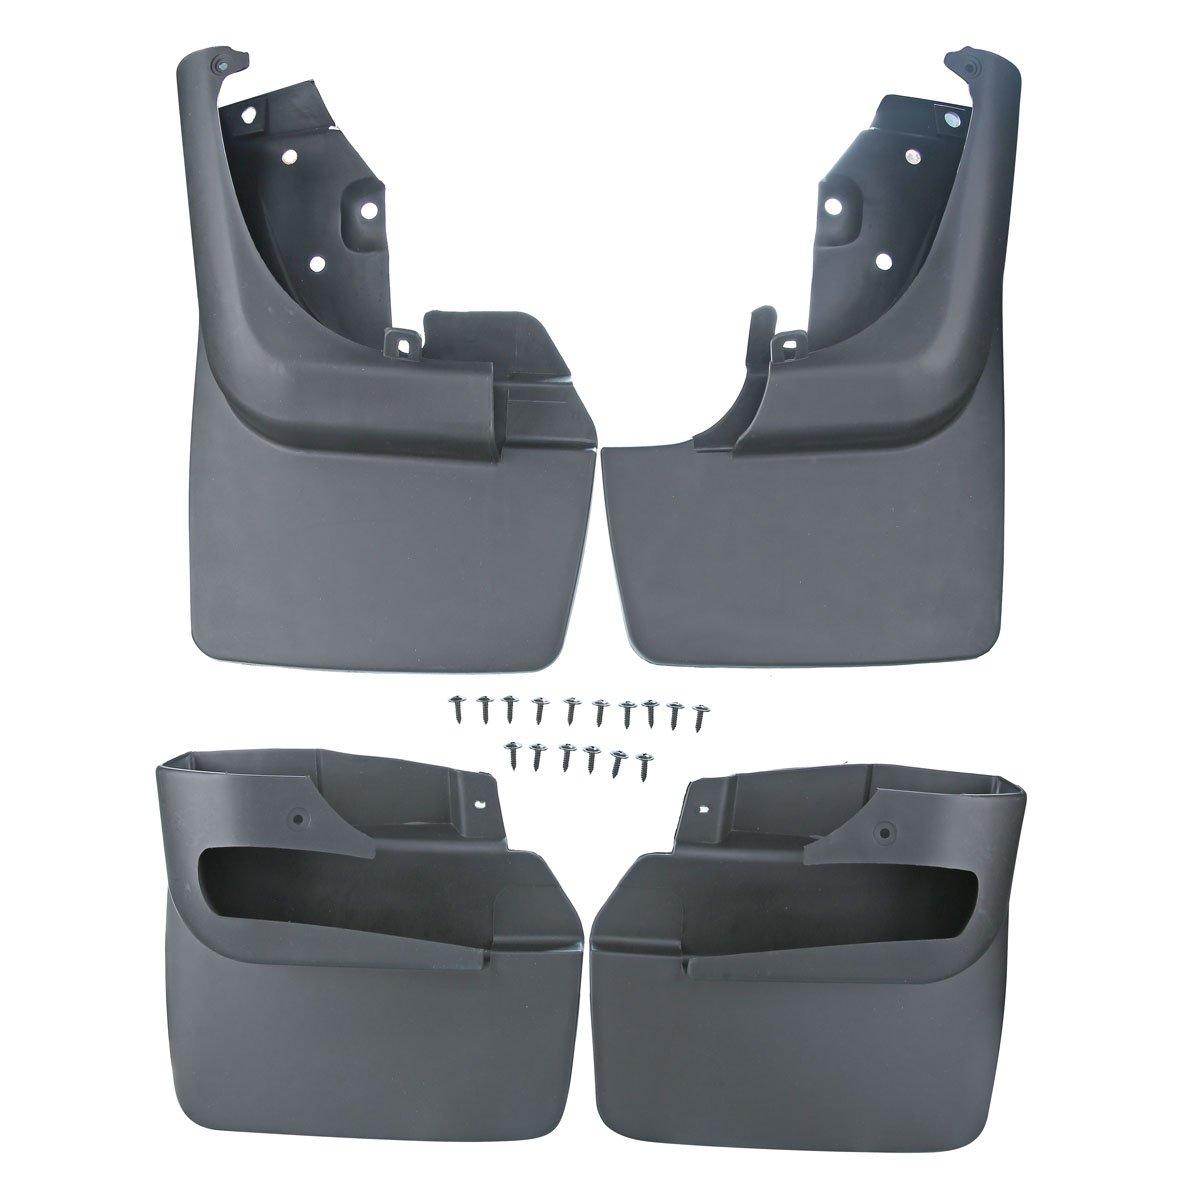 A-Premium Splash Guards Mud Flaps Mudflaps for Toyota LandCruiser 80 Series 1990-1997 withFactoryFenderFlares 4-PC Set